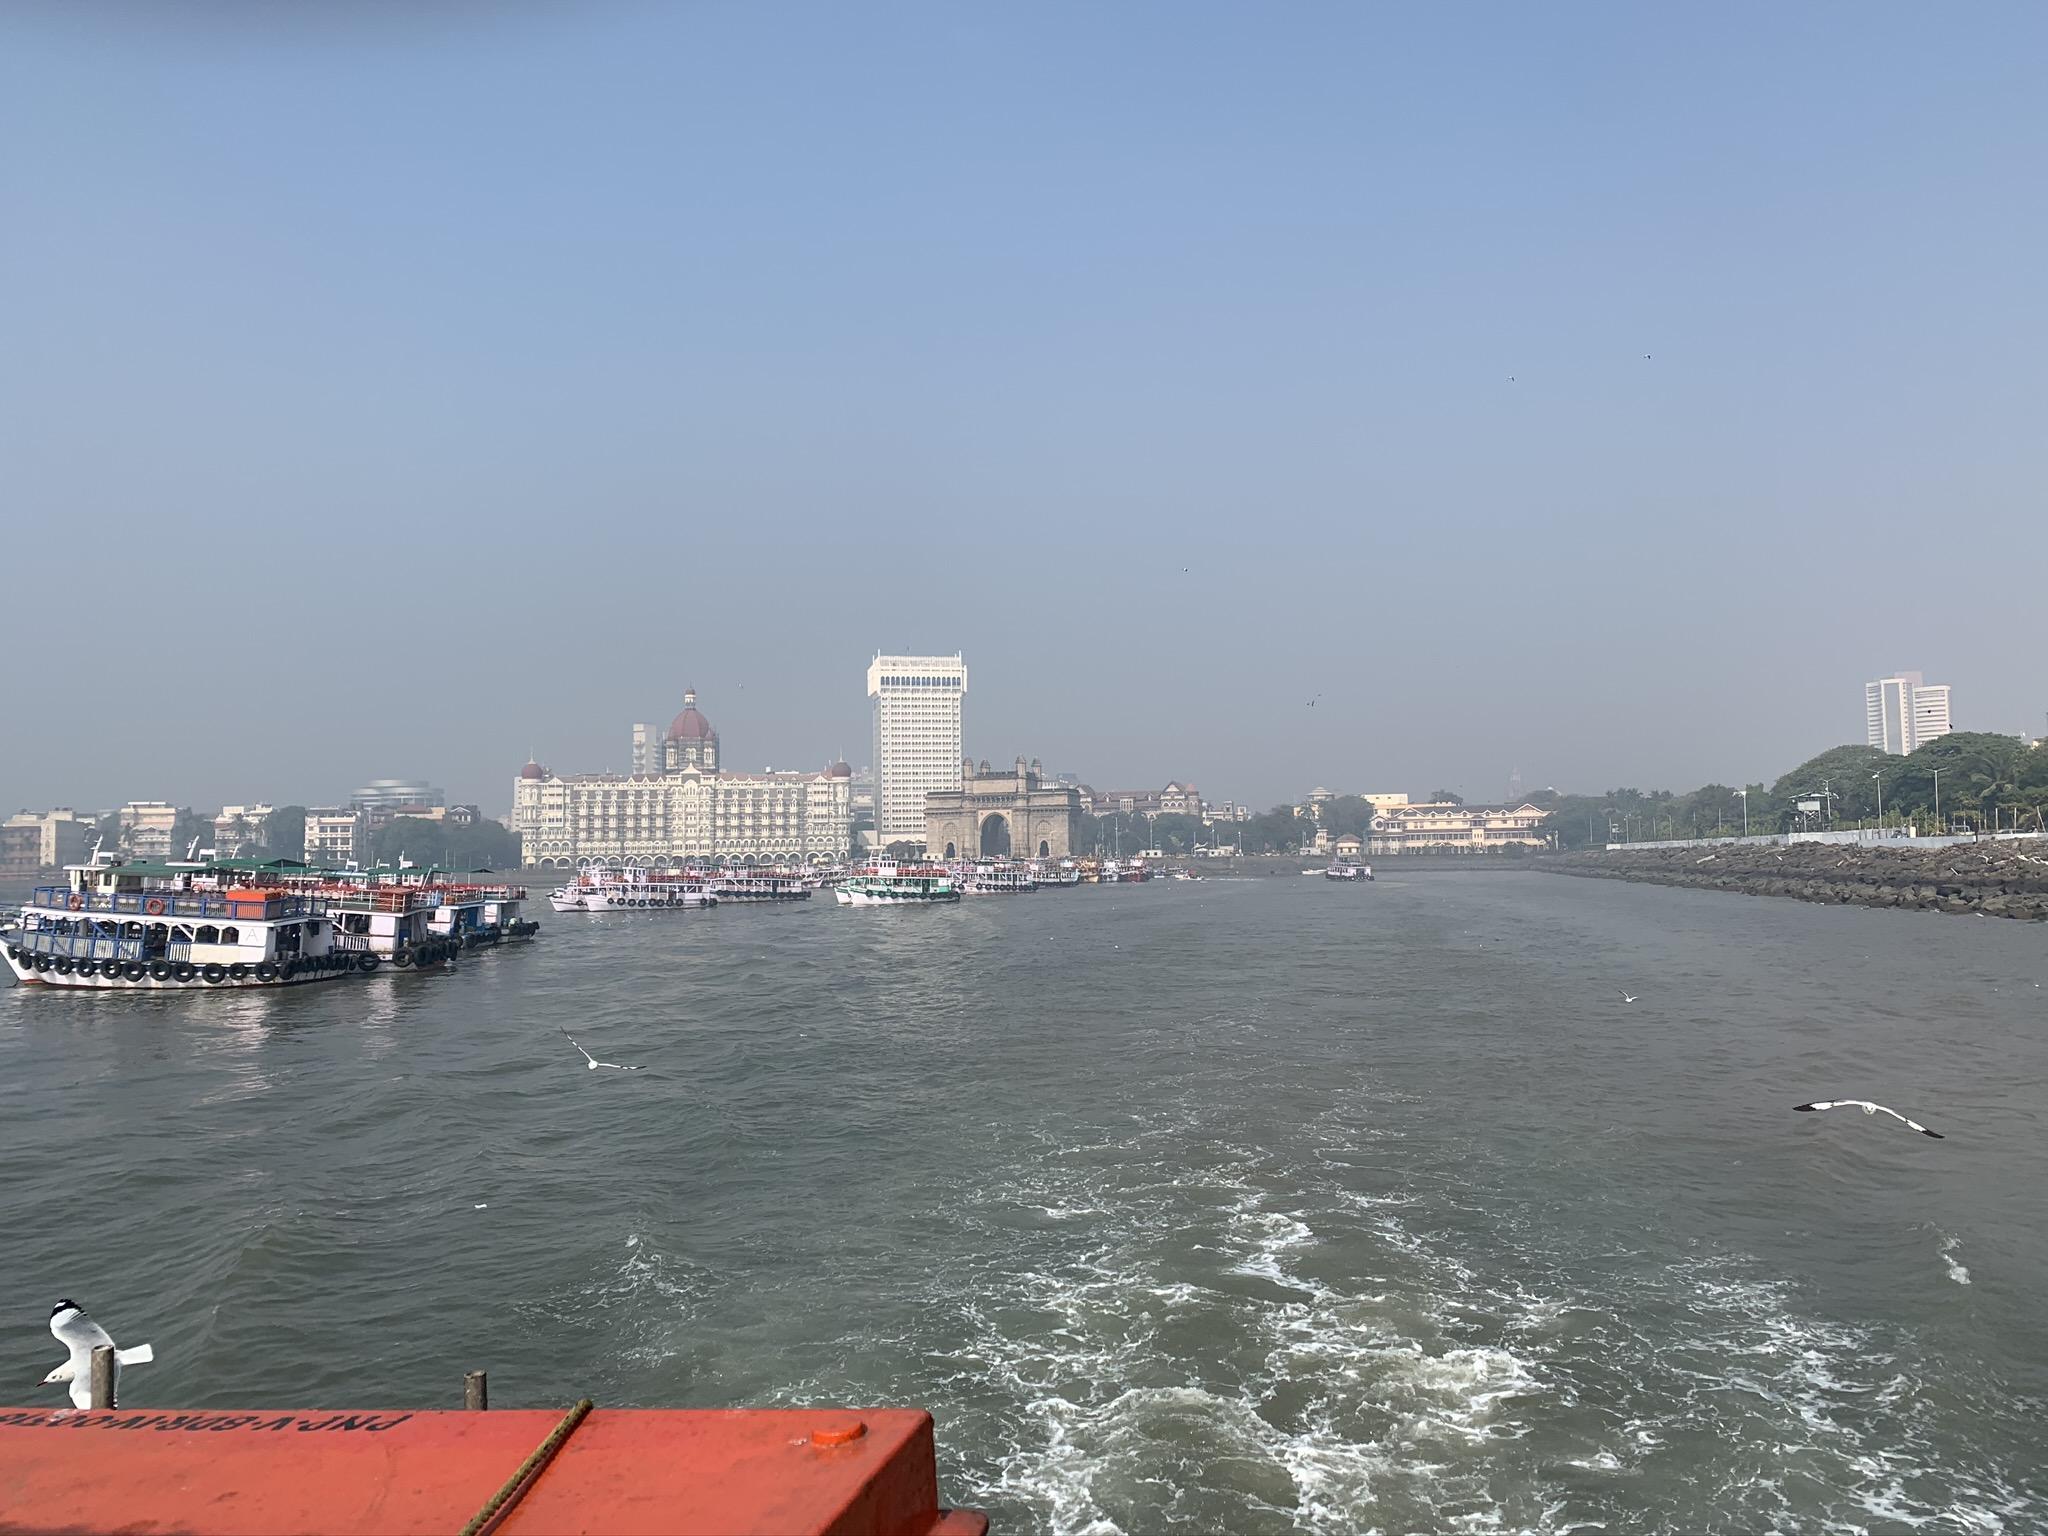 Ferry trip to Alibaug